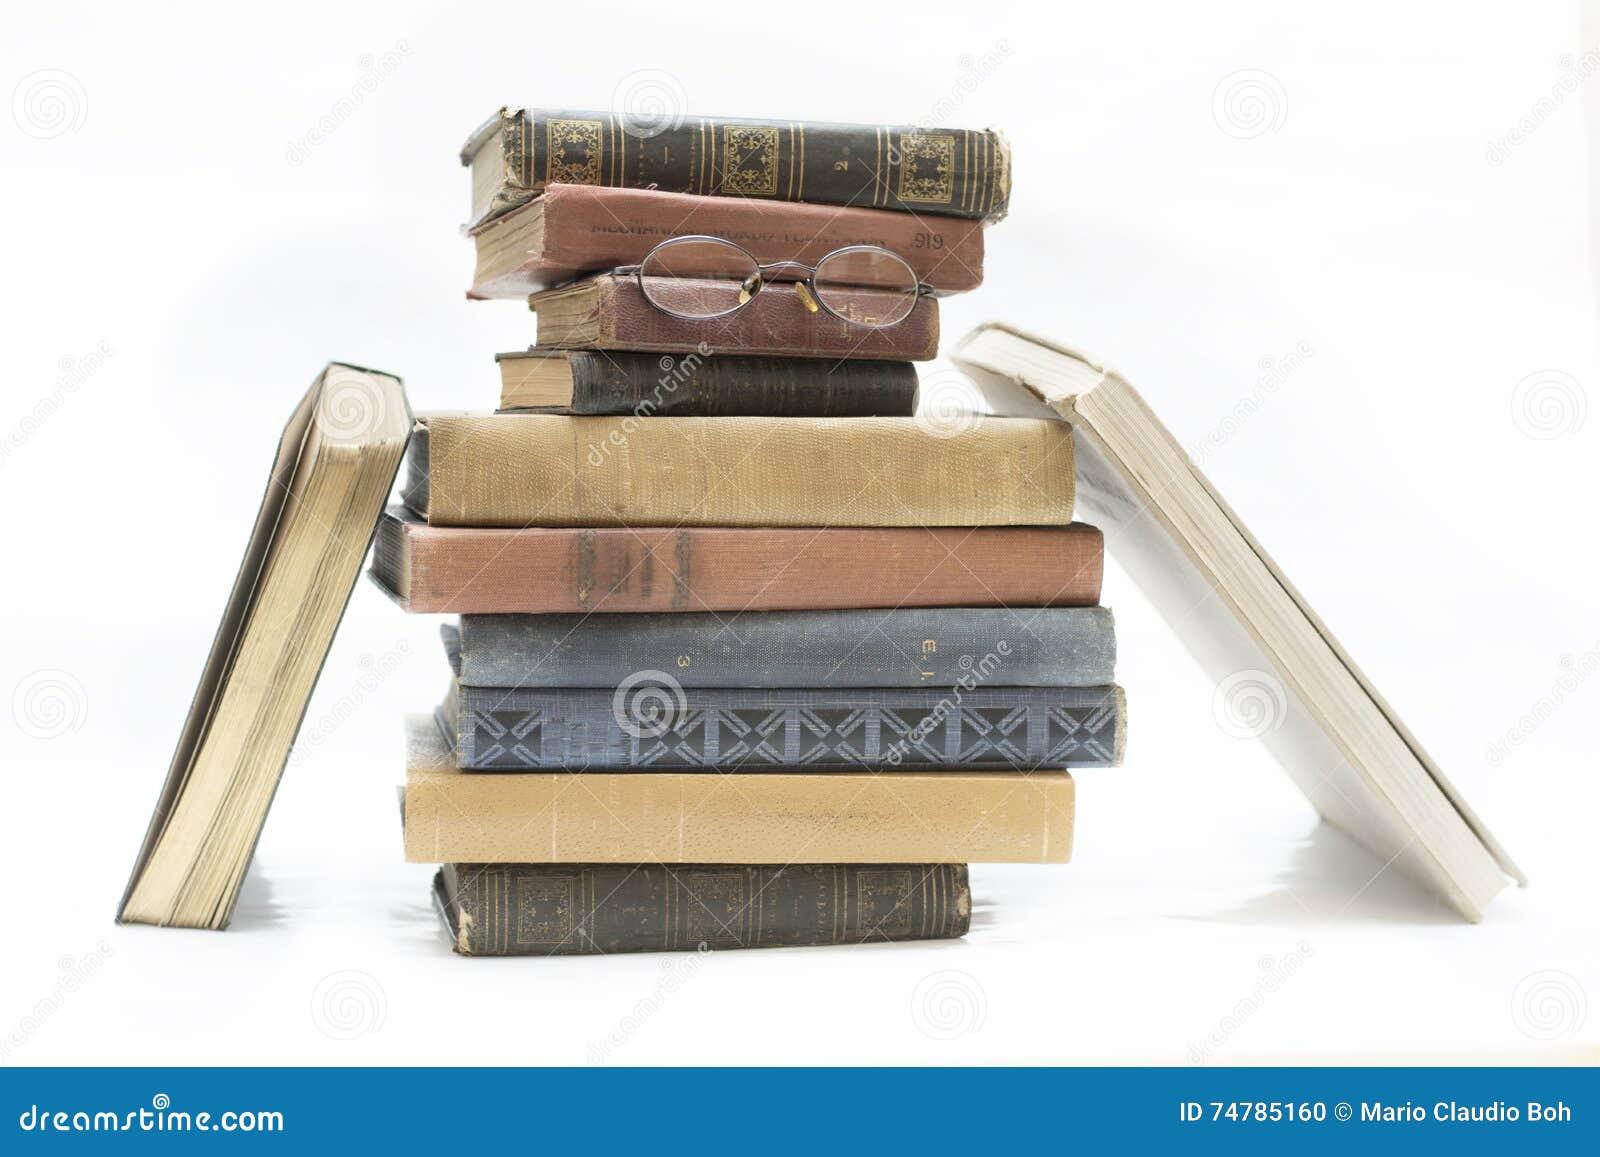 what symbolizes knowledge